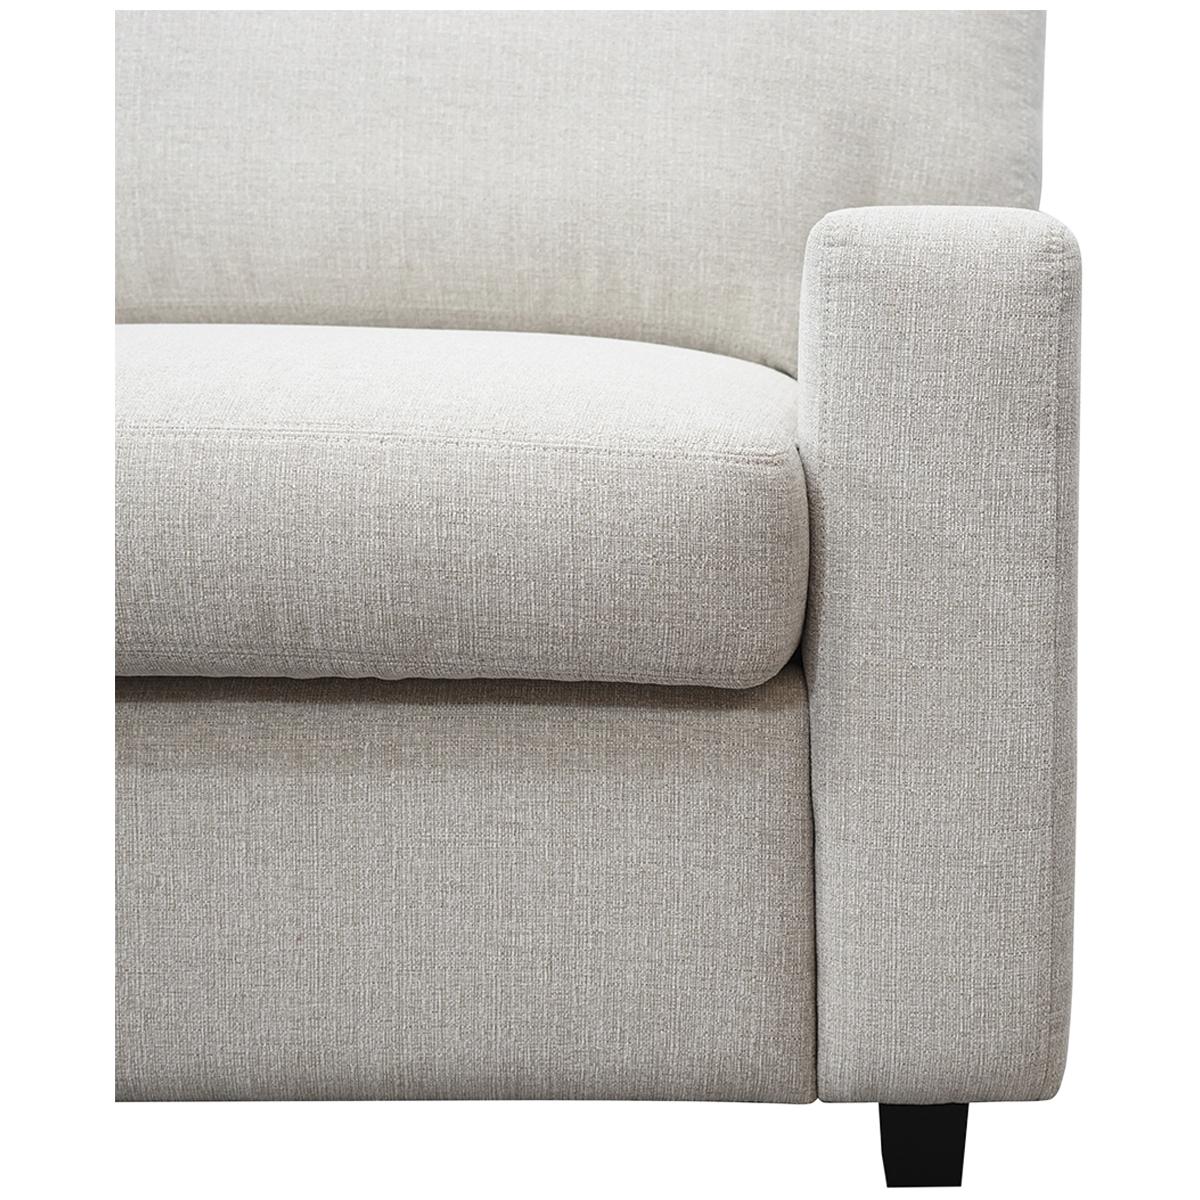 Moran York Double Sofa Bed   Costco Australia